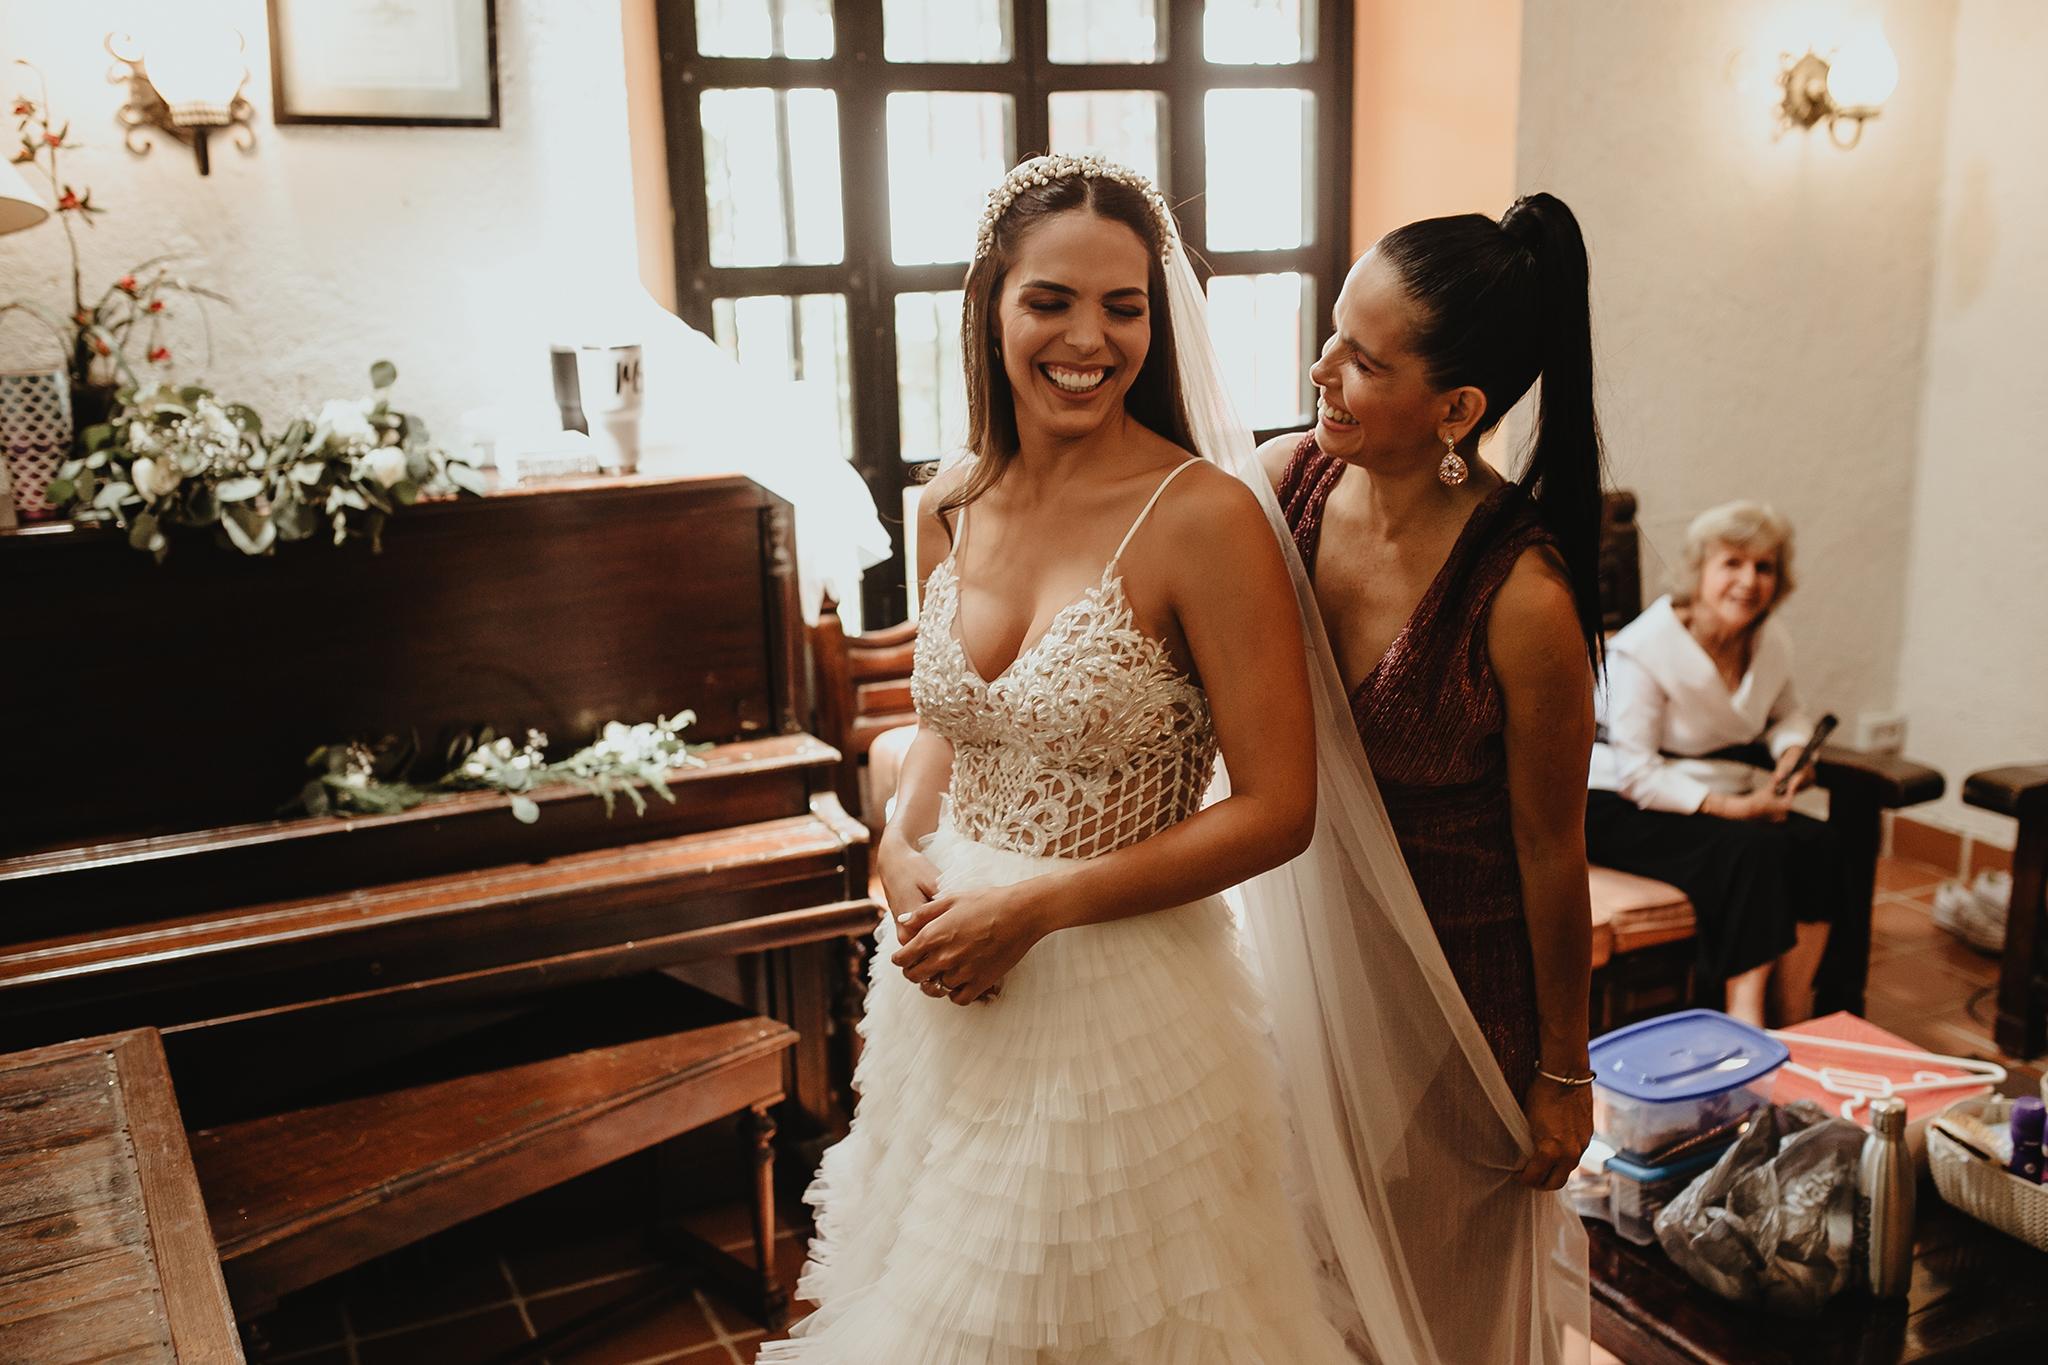 0115R&F__WeddingDestination_Weddingmerida_BodaMexico_FotografoDeBodas_FabrizioSimoneenFotografo.jpg